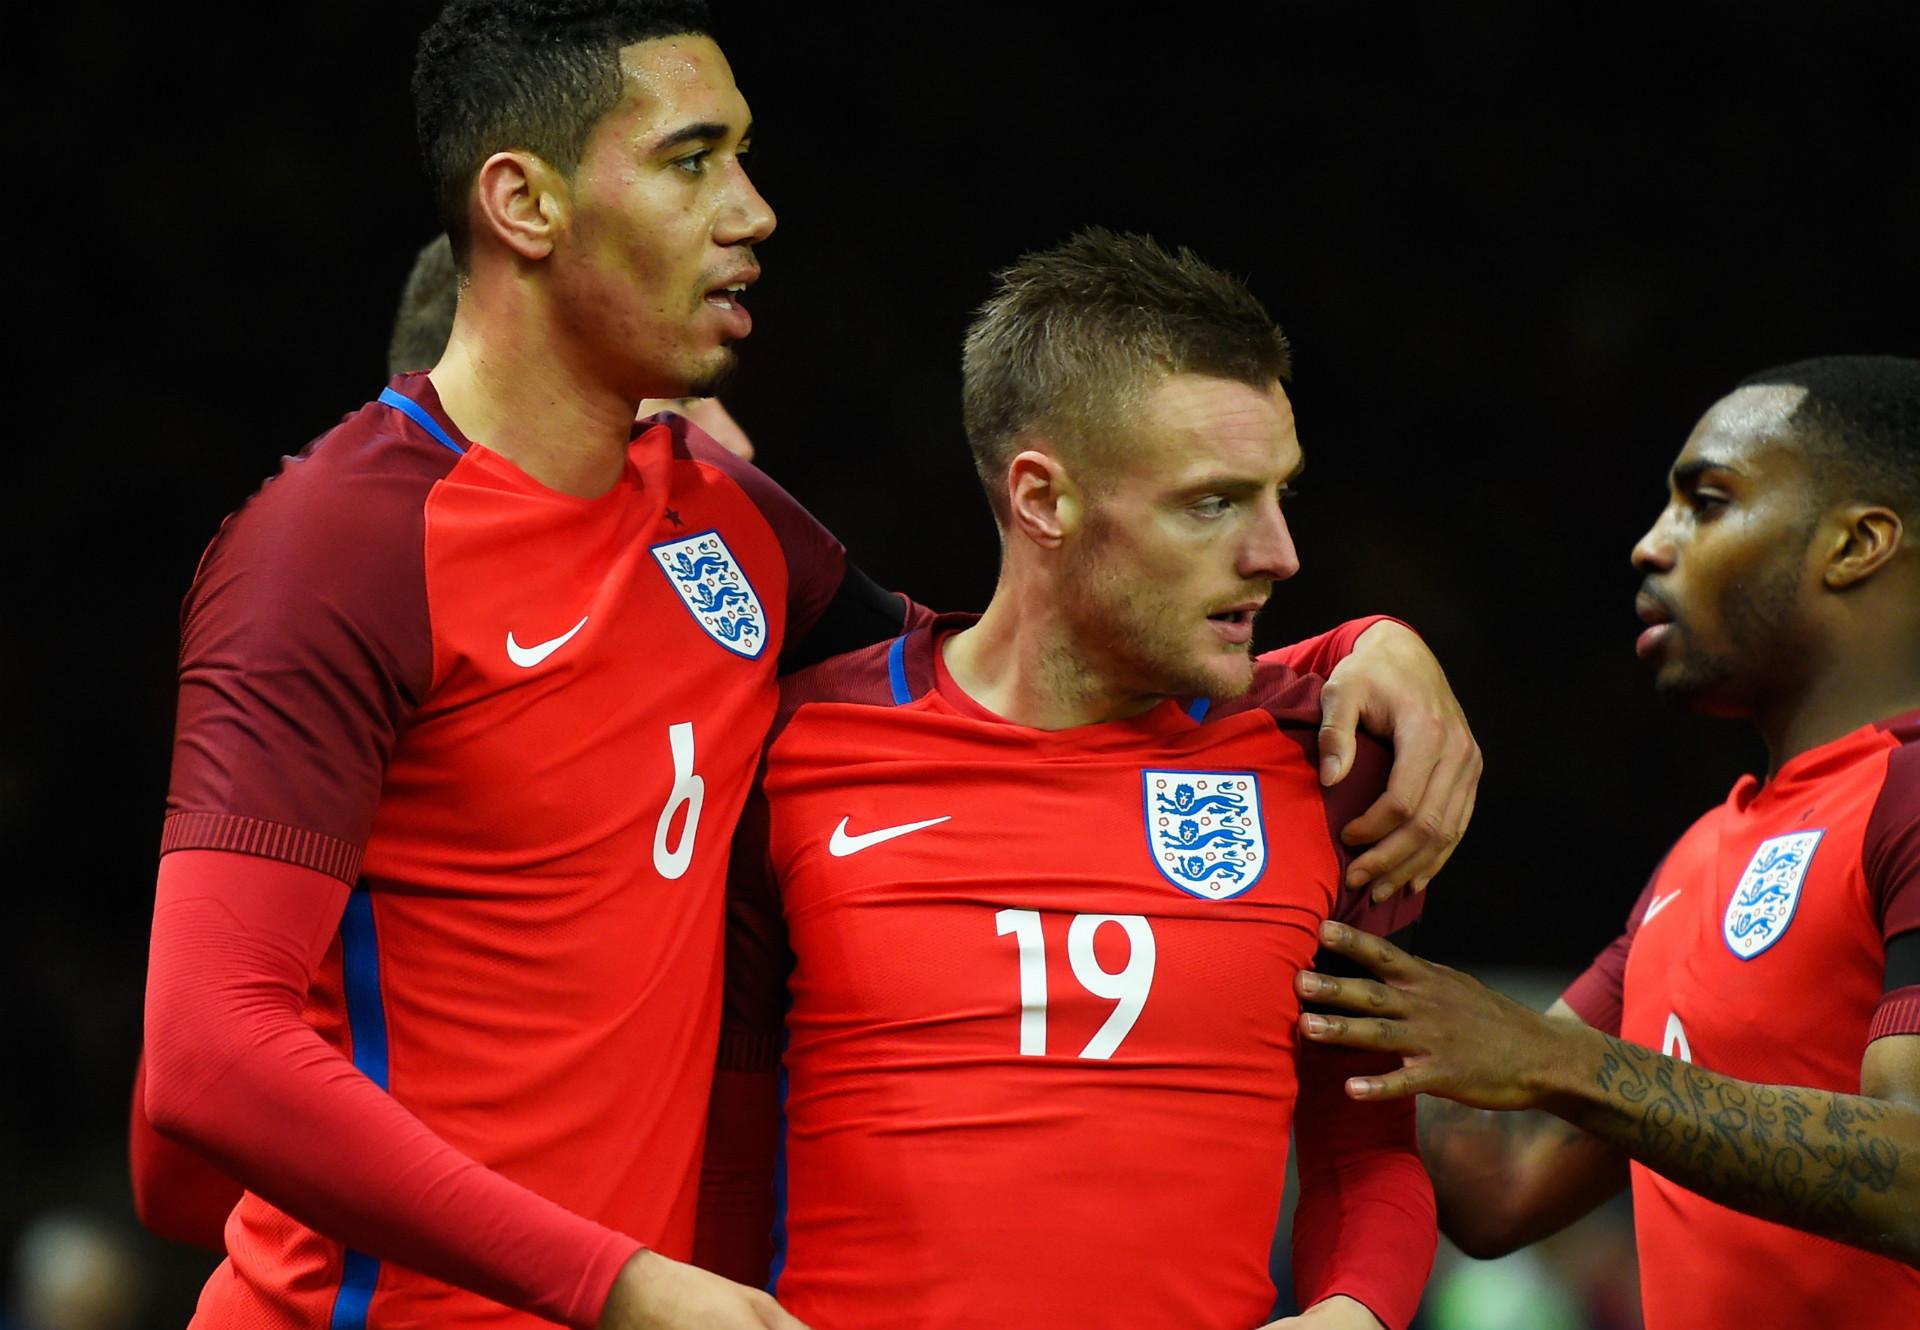 Ponturi fotbal EURO 2016 Anglia vs Turcia